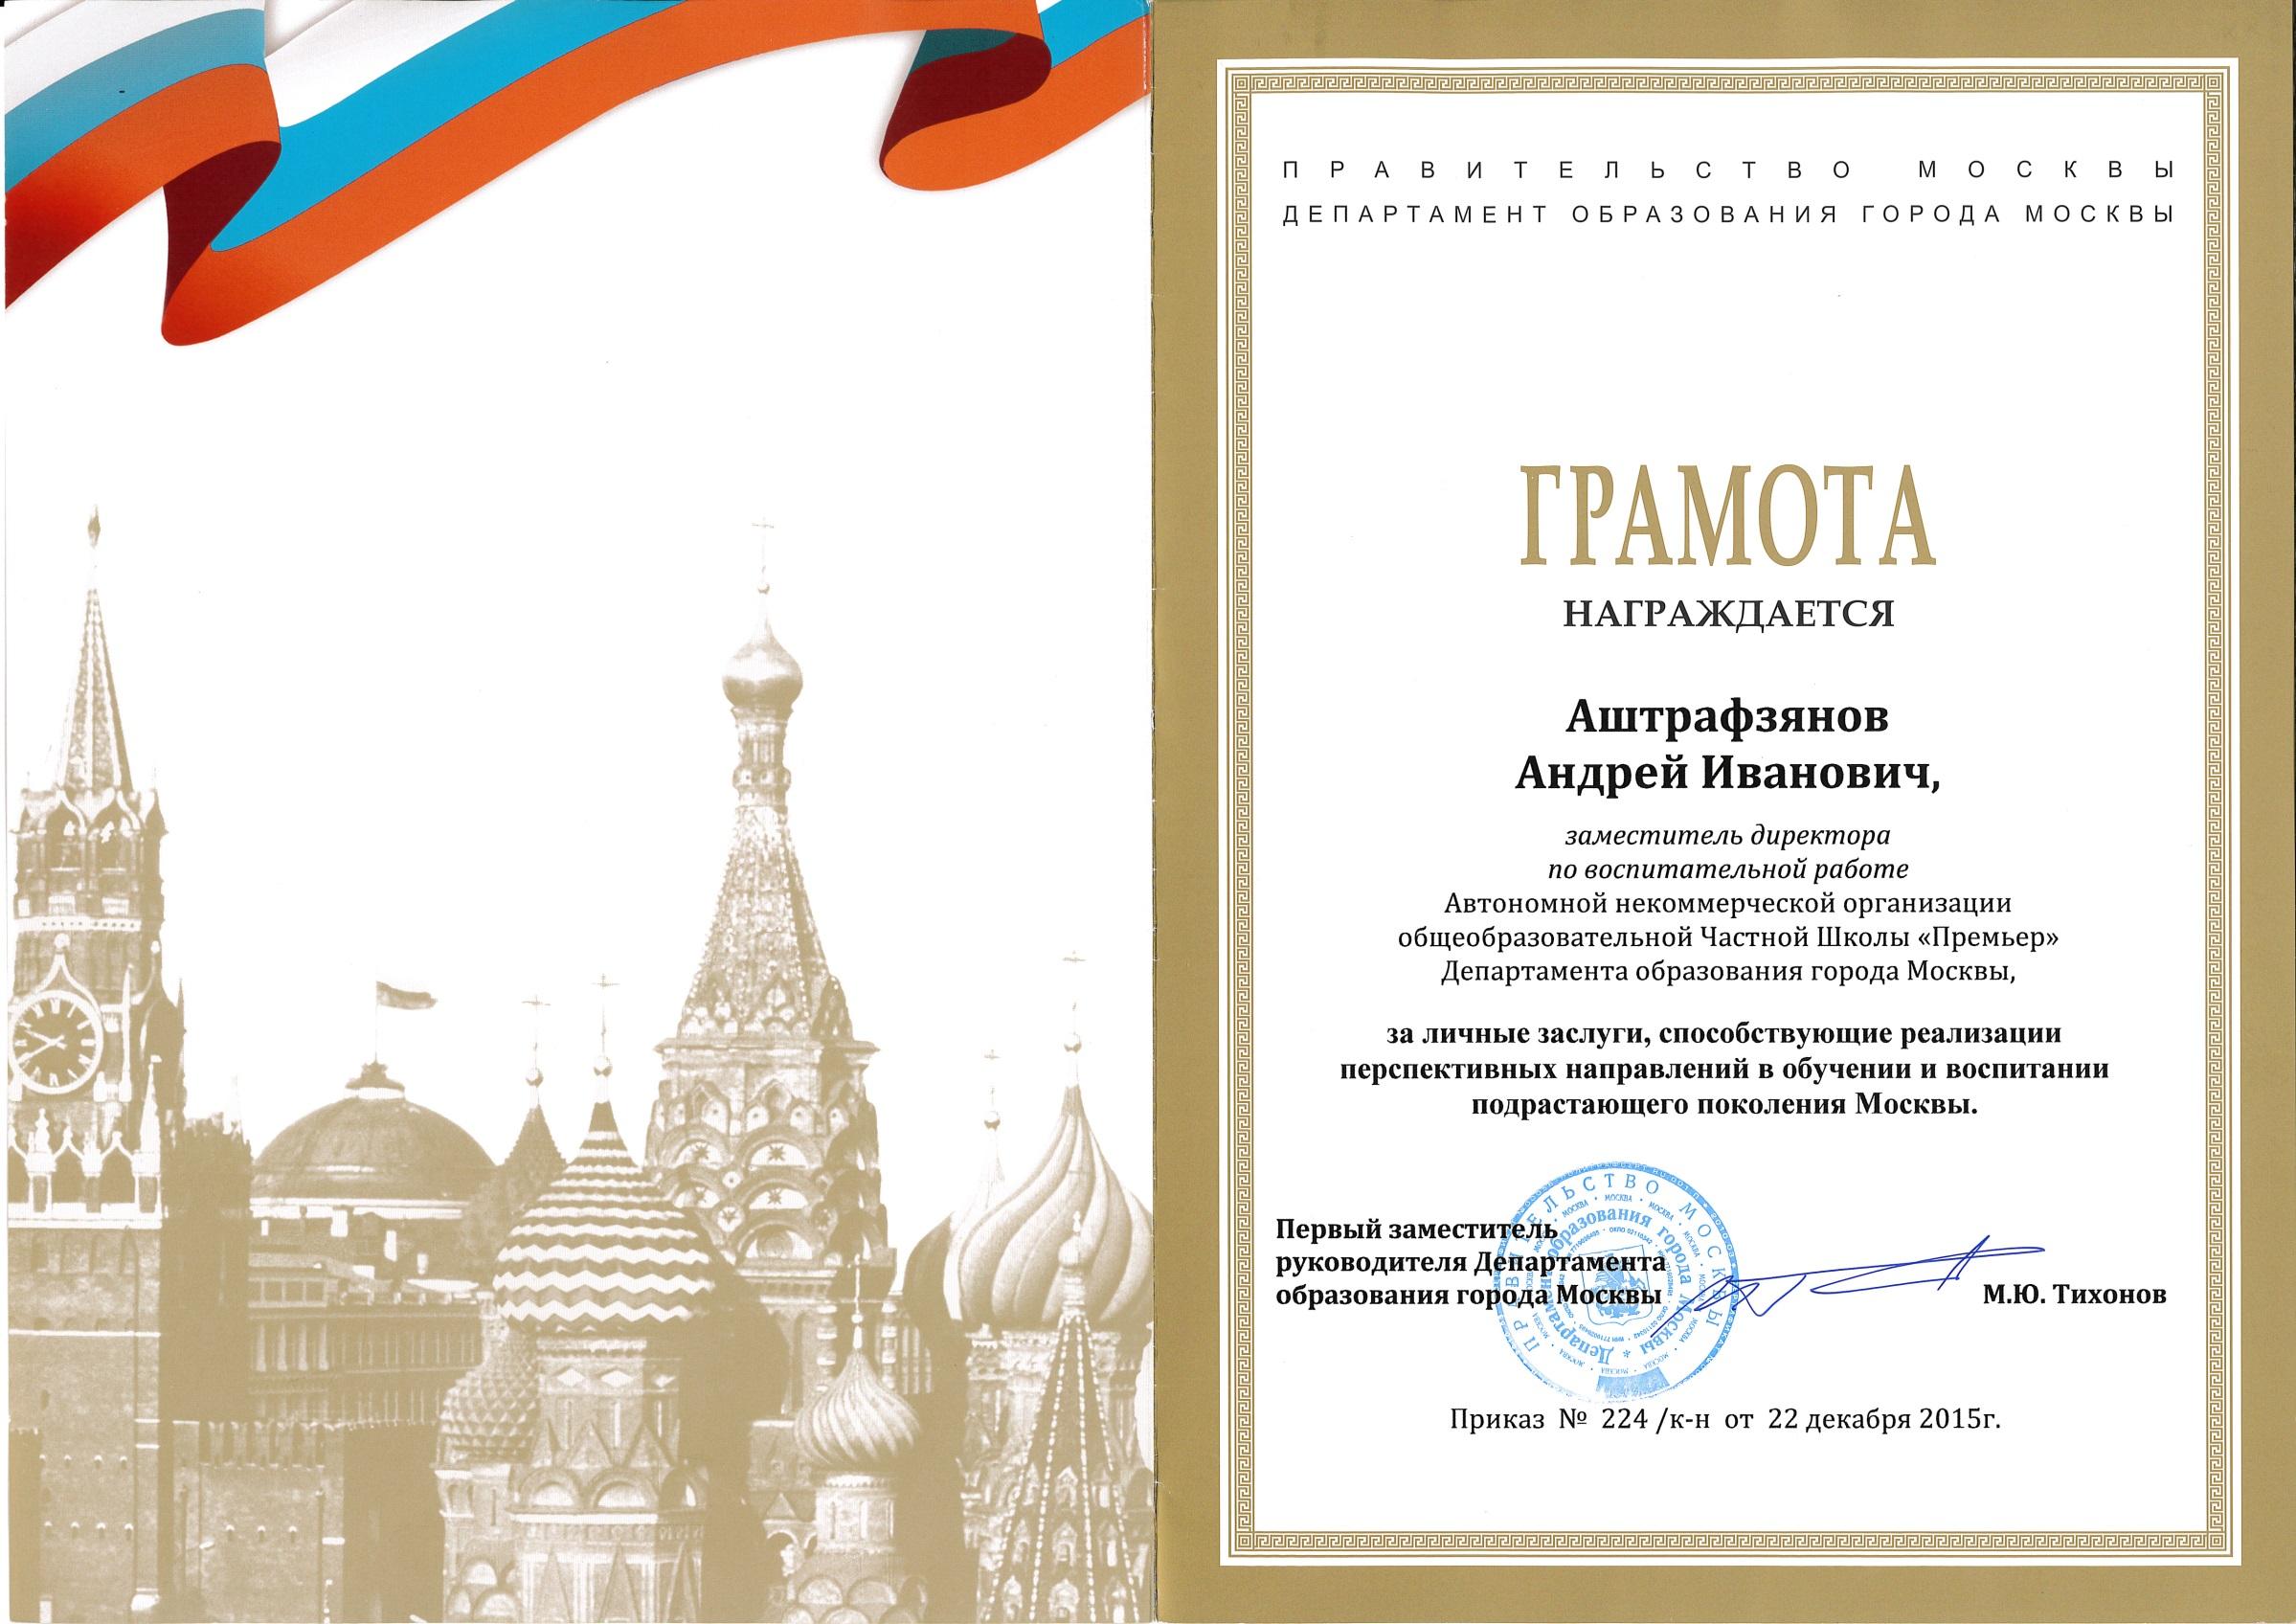 \\SERVER-SCHOOL-N\Andrey\Моя аттестация\Грамота Правительства Москвы.jpg